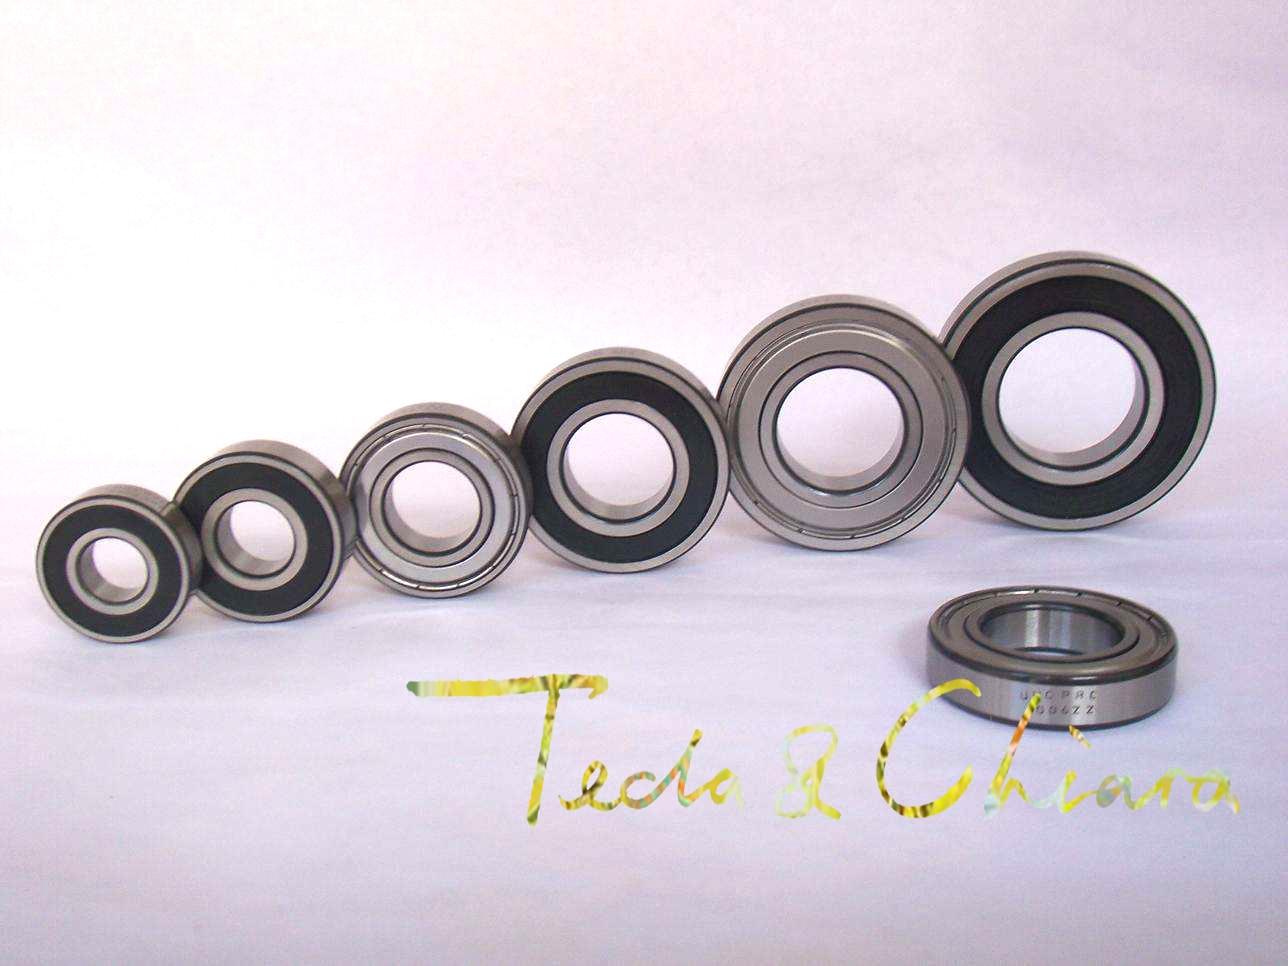 6800 6800ZZ 6800RS 6800-2Z 6800Z 6800-2RS ZZ RS RZ 2RZ Deep Groove Ball Bearings 10 x 19 x 5mm High Quality gcr15 6326 zz or 6326 2rs 130x280x58mm high precision deep groove ball bearings abec 1 p0